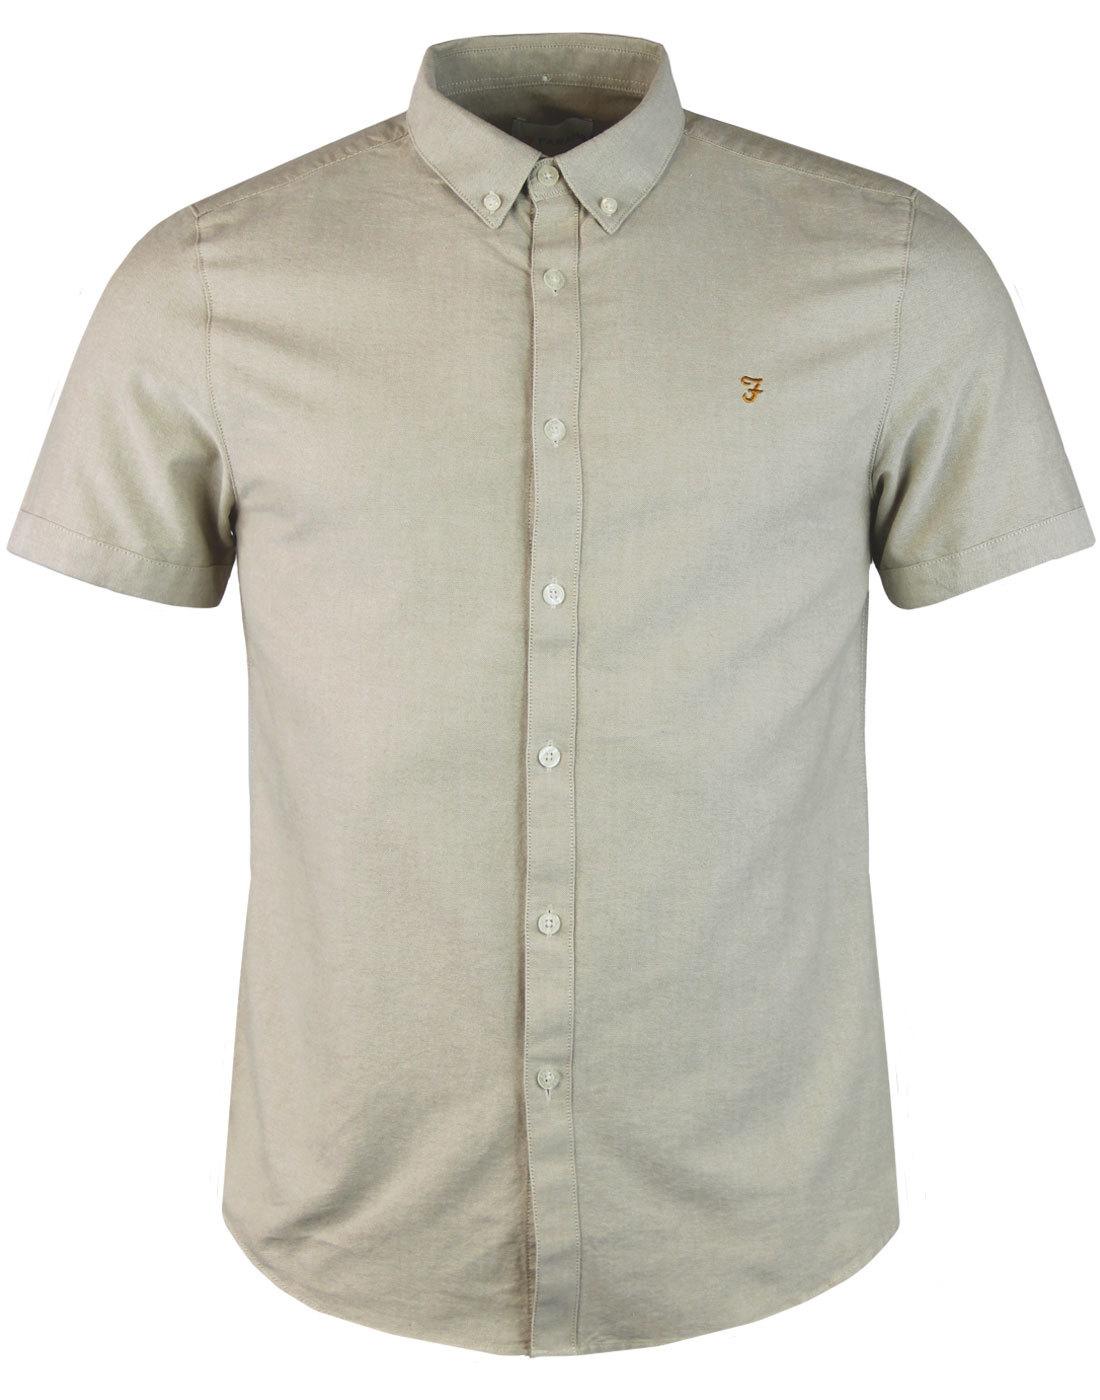 Brewer FARAH 60s Mod Slim S/S Oxford Shirt ALMOND